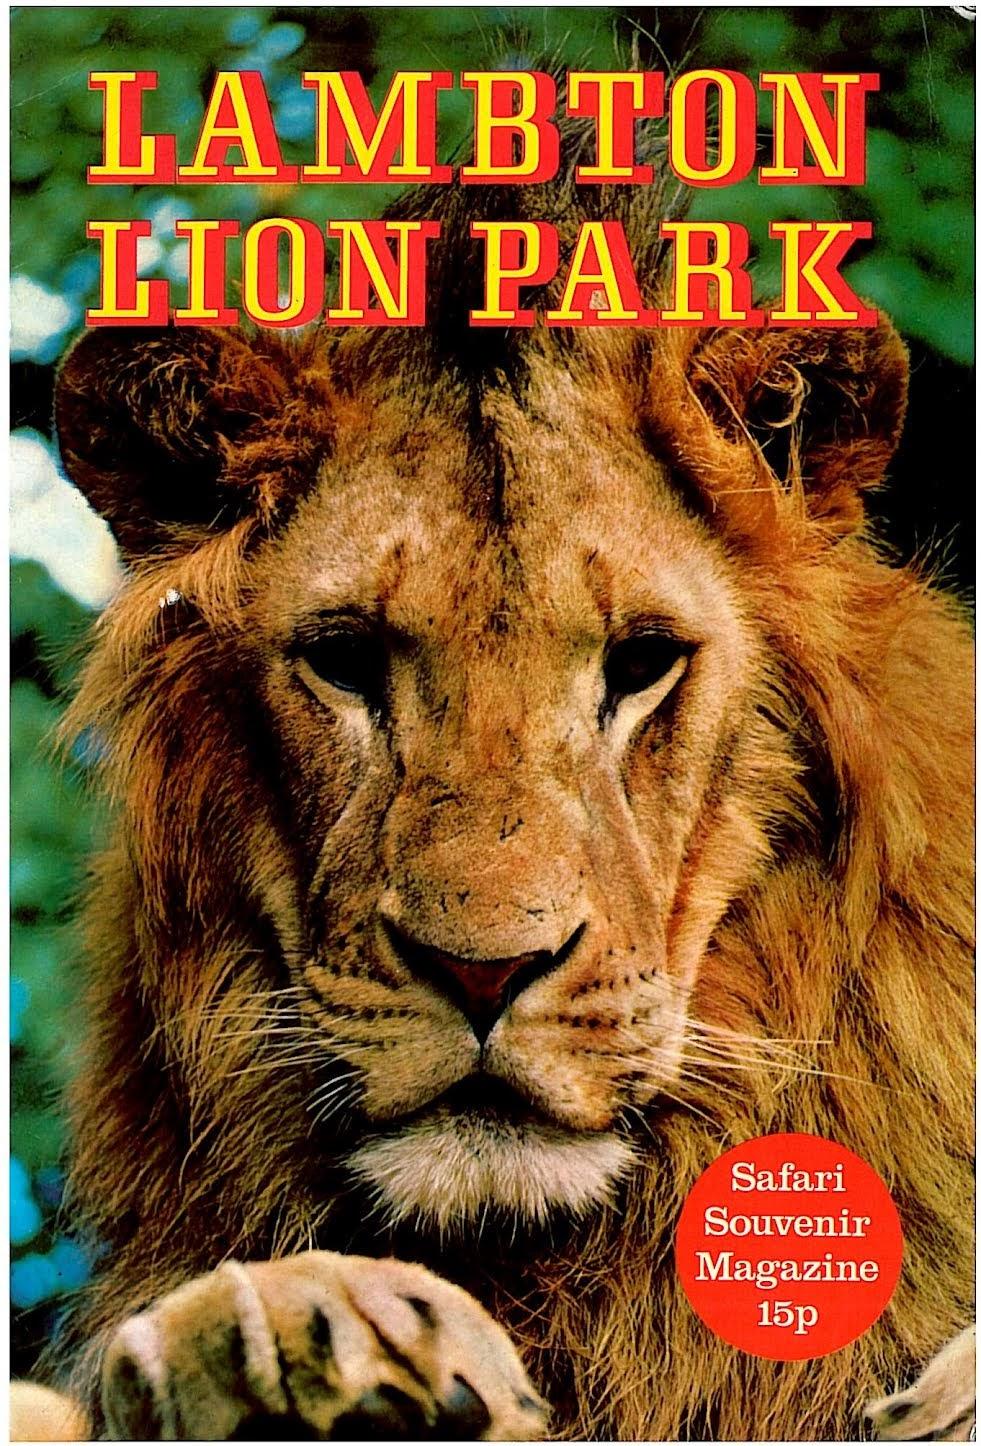 Image result for lambton lion park